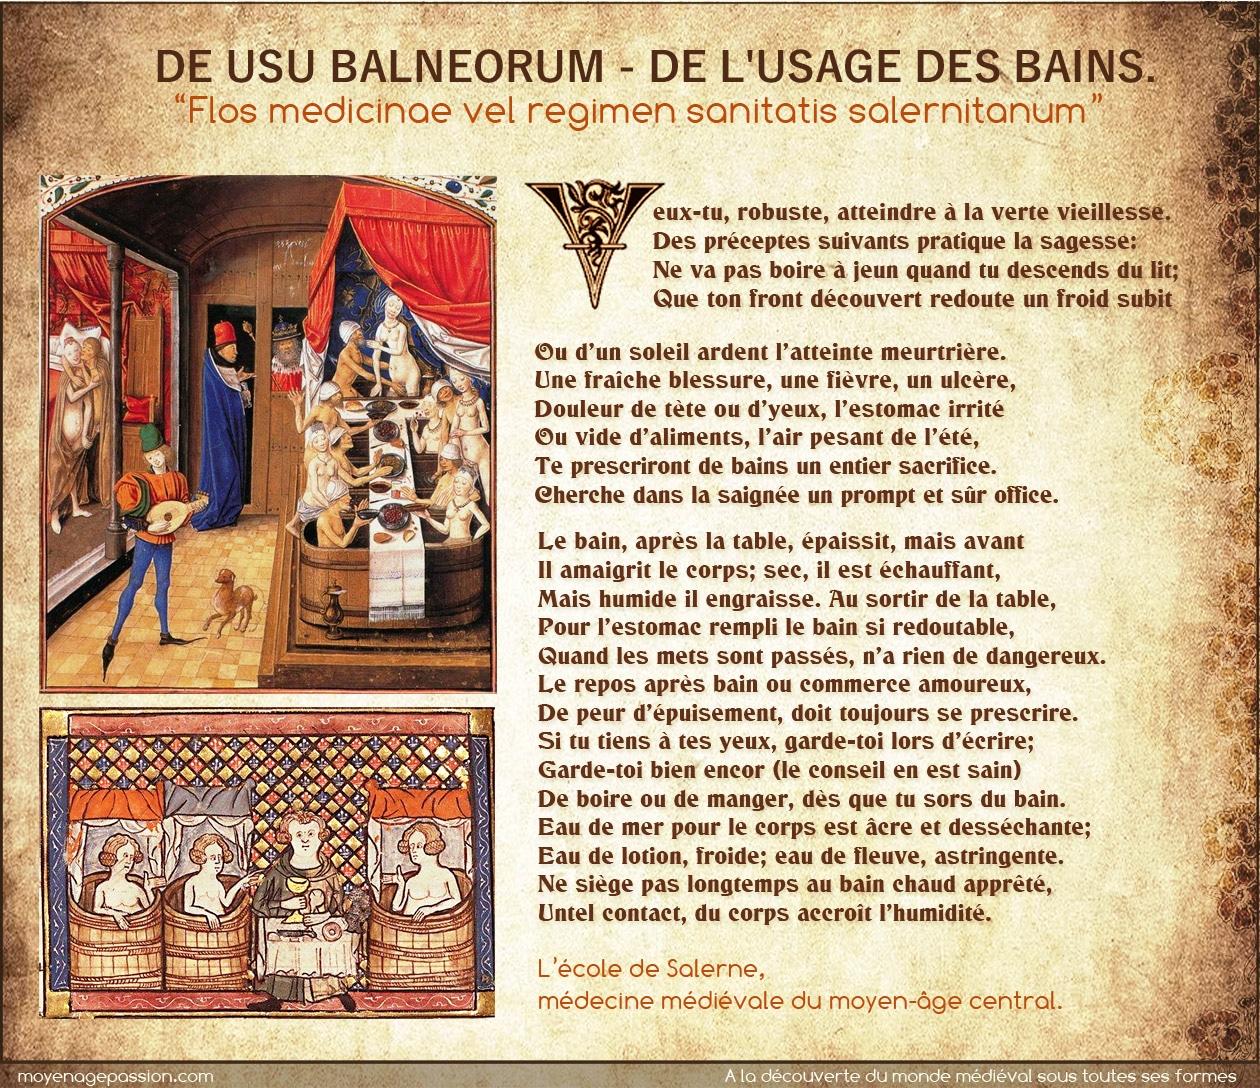 hygiene_medecine_medievale_bains_etuve_ecole_salerne_regimen_sanitatis_citation_poesie